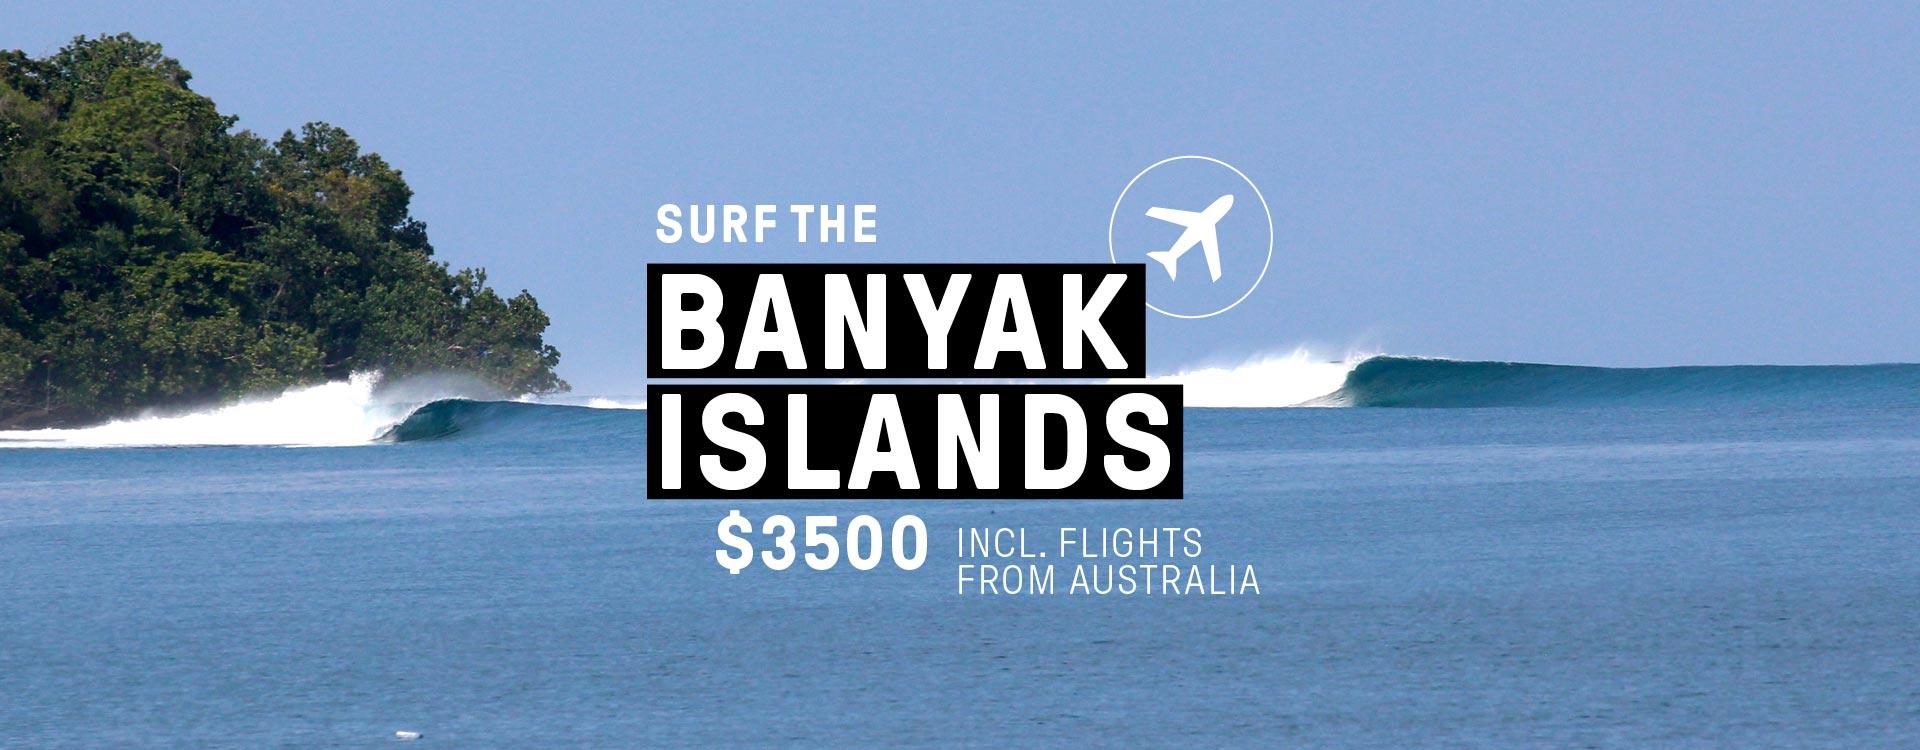 Surf the Banyak Islands for $3500 including return flights from Australia